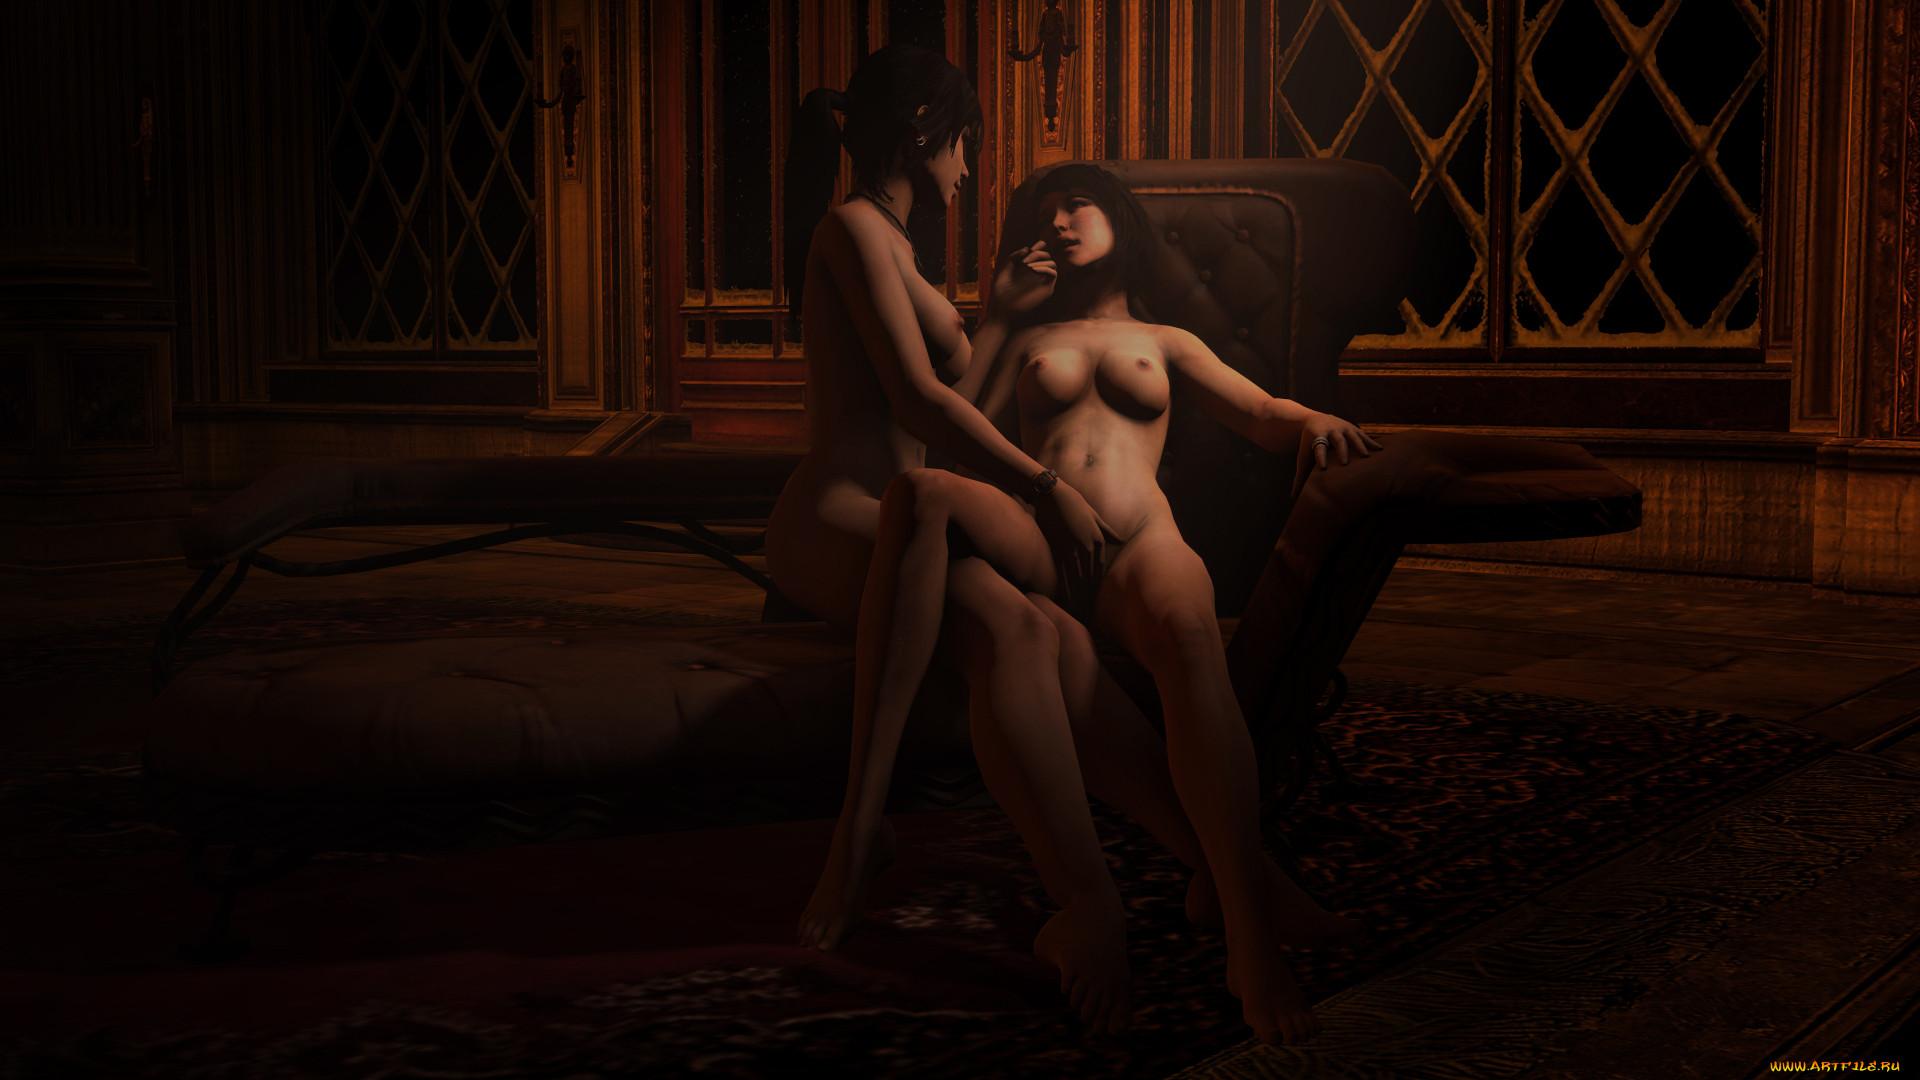 Tomb raider sex gallery erotic video